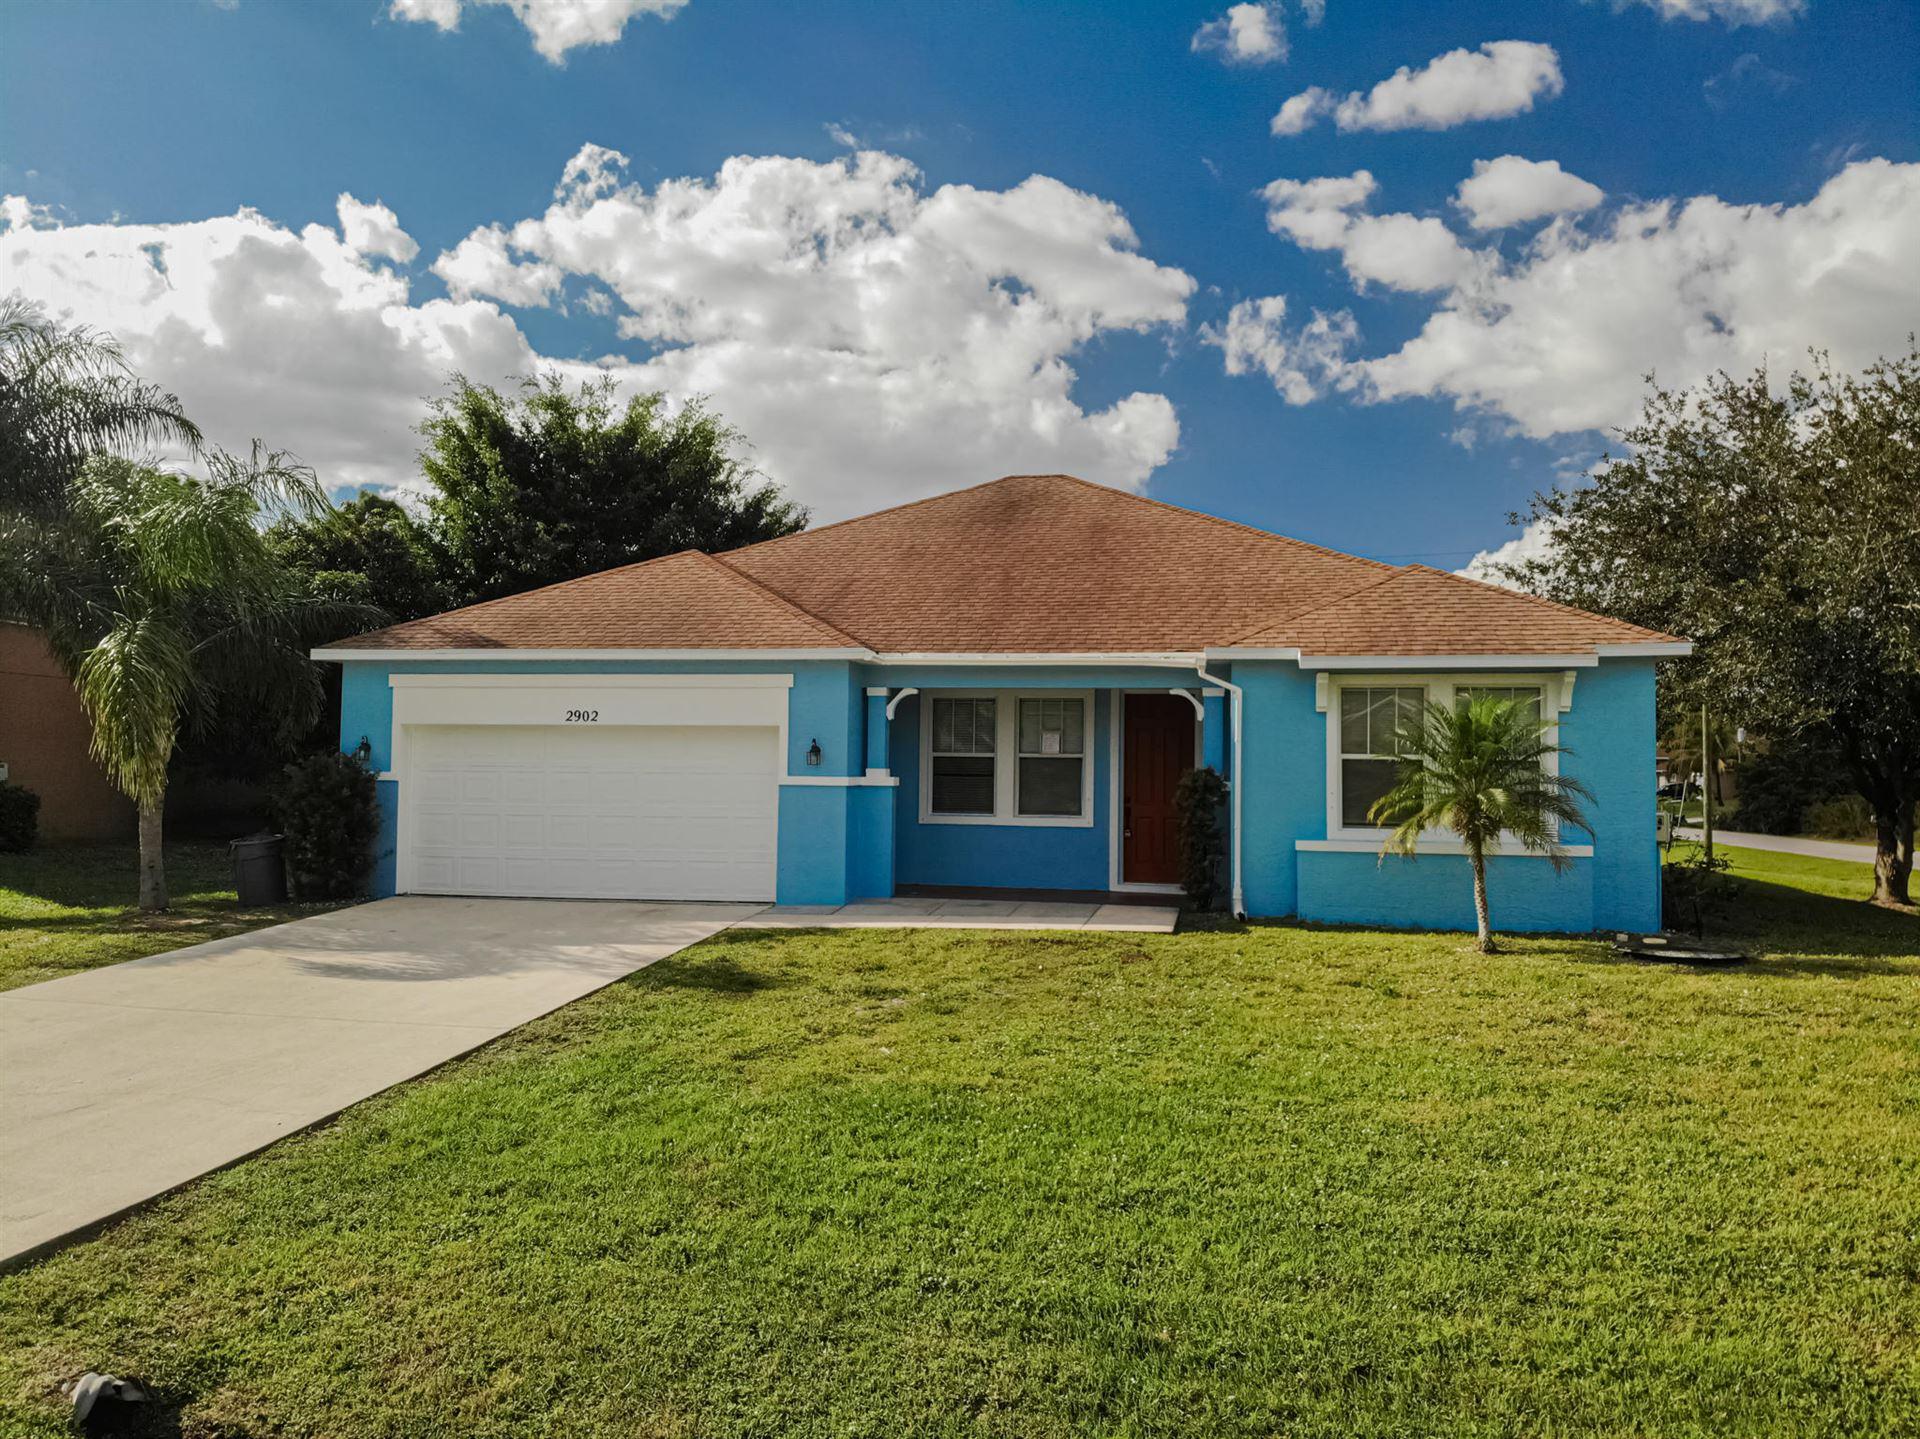 2902 SW Bright Street, Port Saint Lucie, FL 34953 - #: RX-10674150